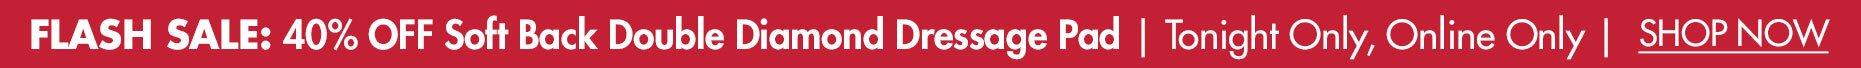 Flash Sale:  40% OFF Dover Saddlery® Soft Back Double Diamond Dressage Pad